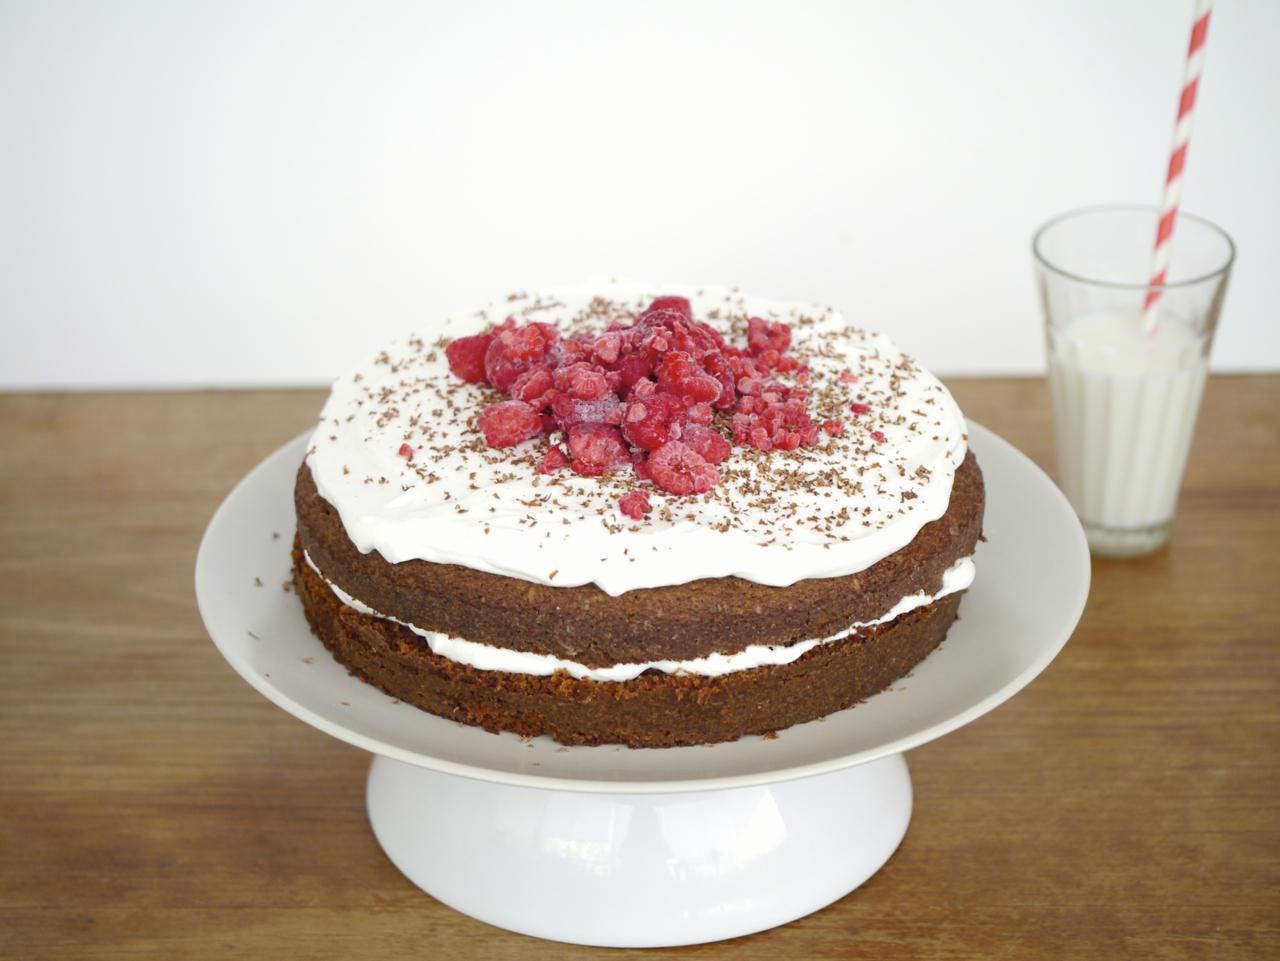 recipe developer, styling & photography - The white Chef website & social media2012-2014